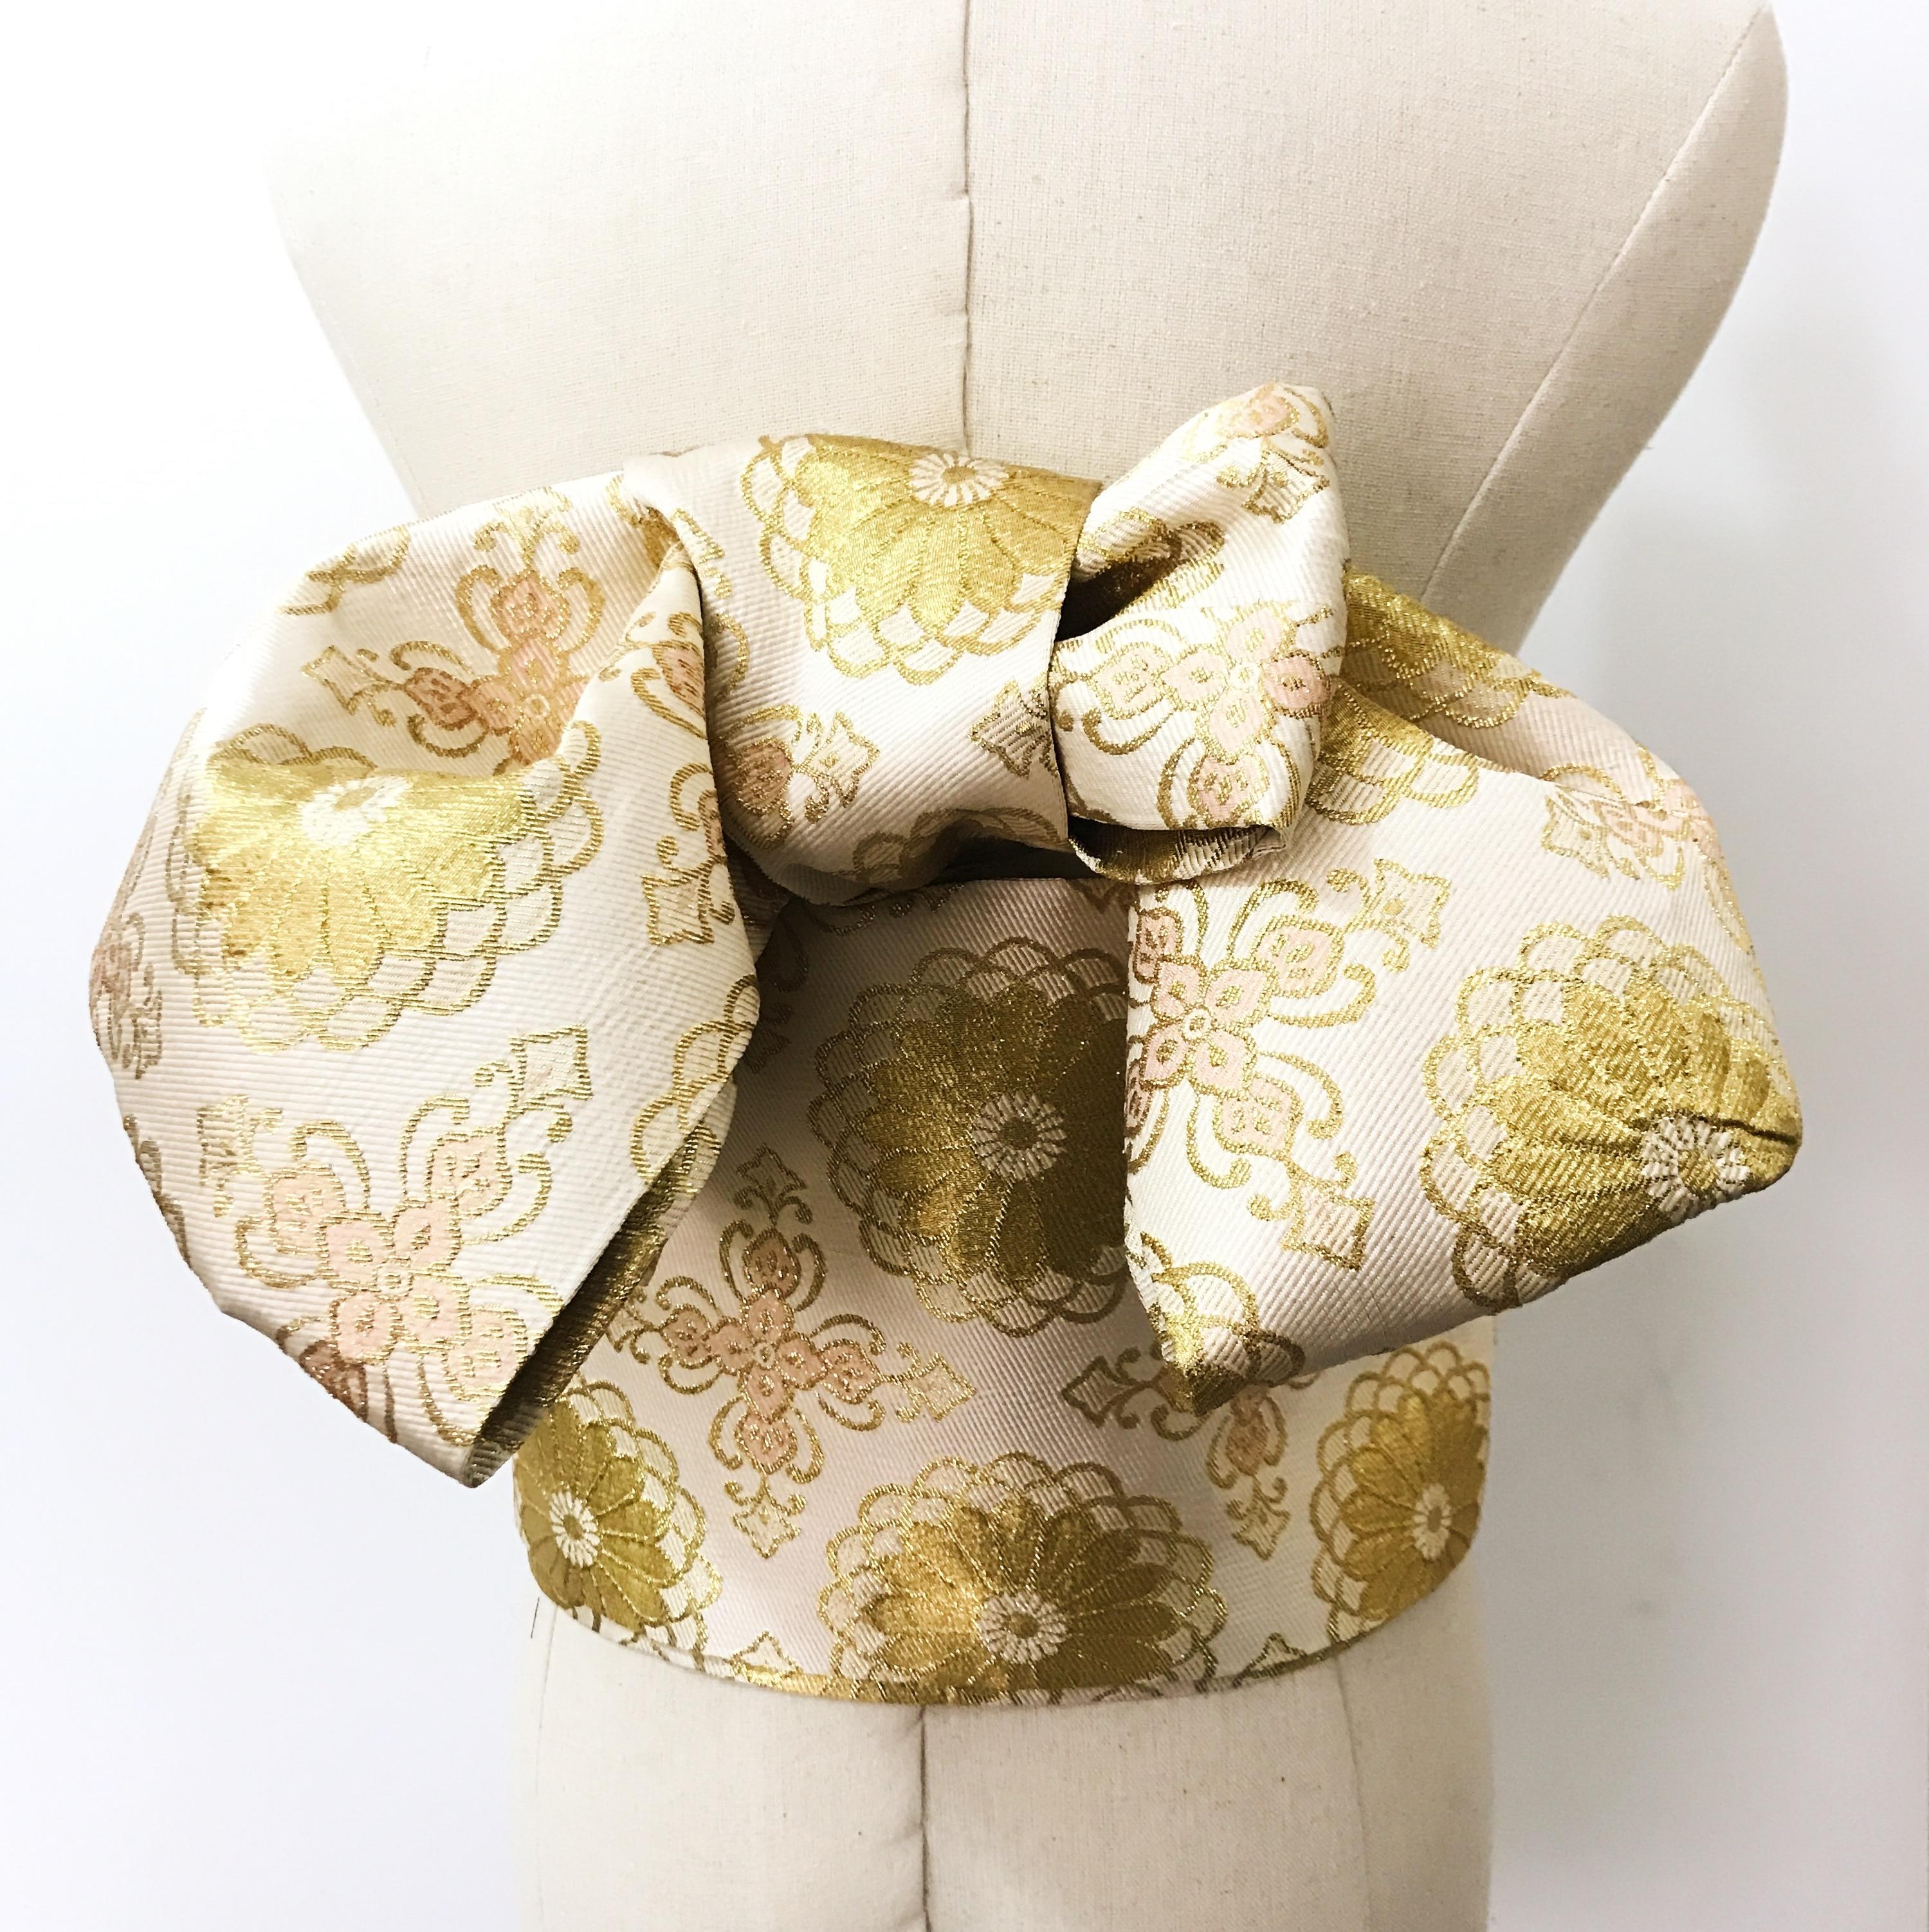 2019 Kimono Accessories Styling 6 Style  Large Bow Waist Belt